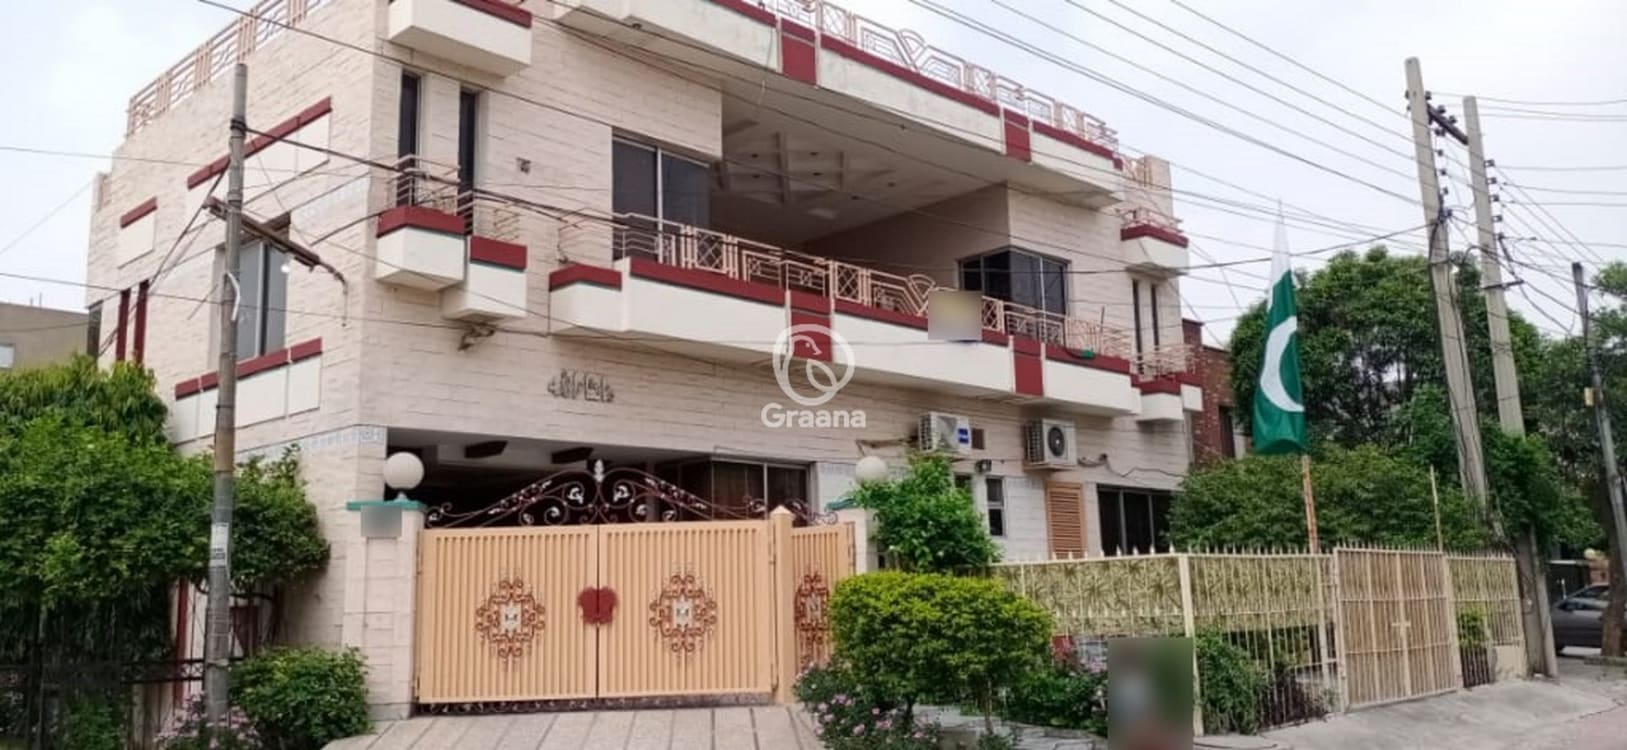 13 Marla House For Rent | Graana.com